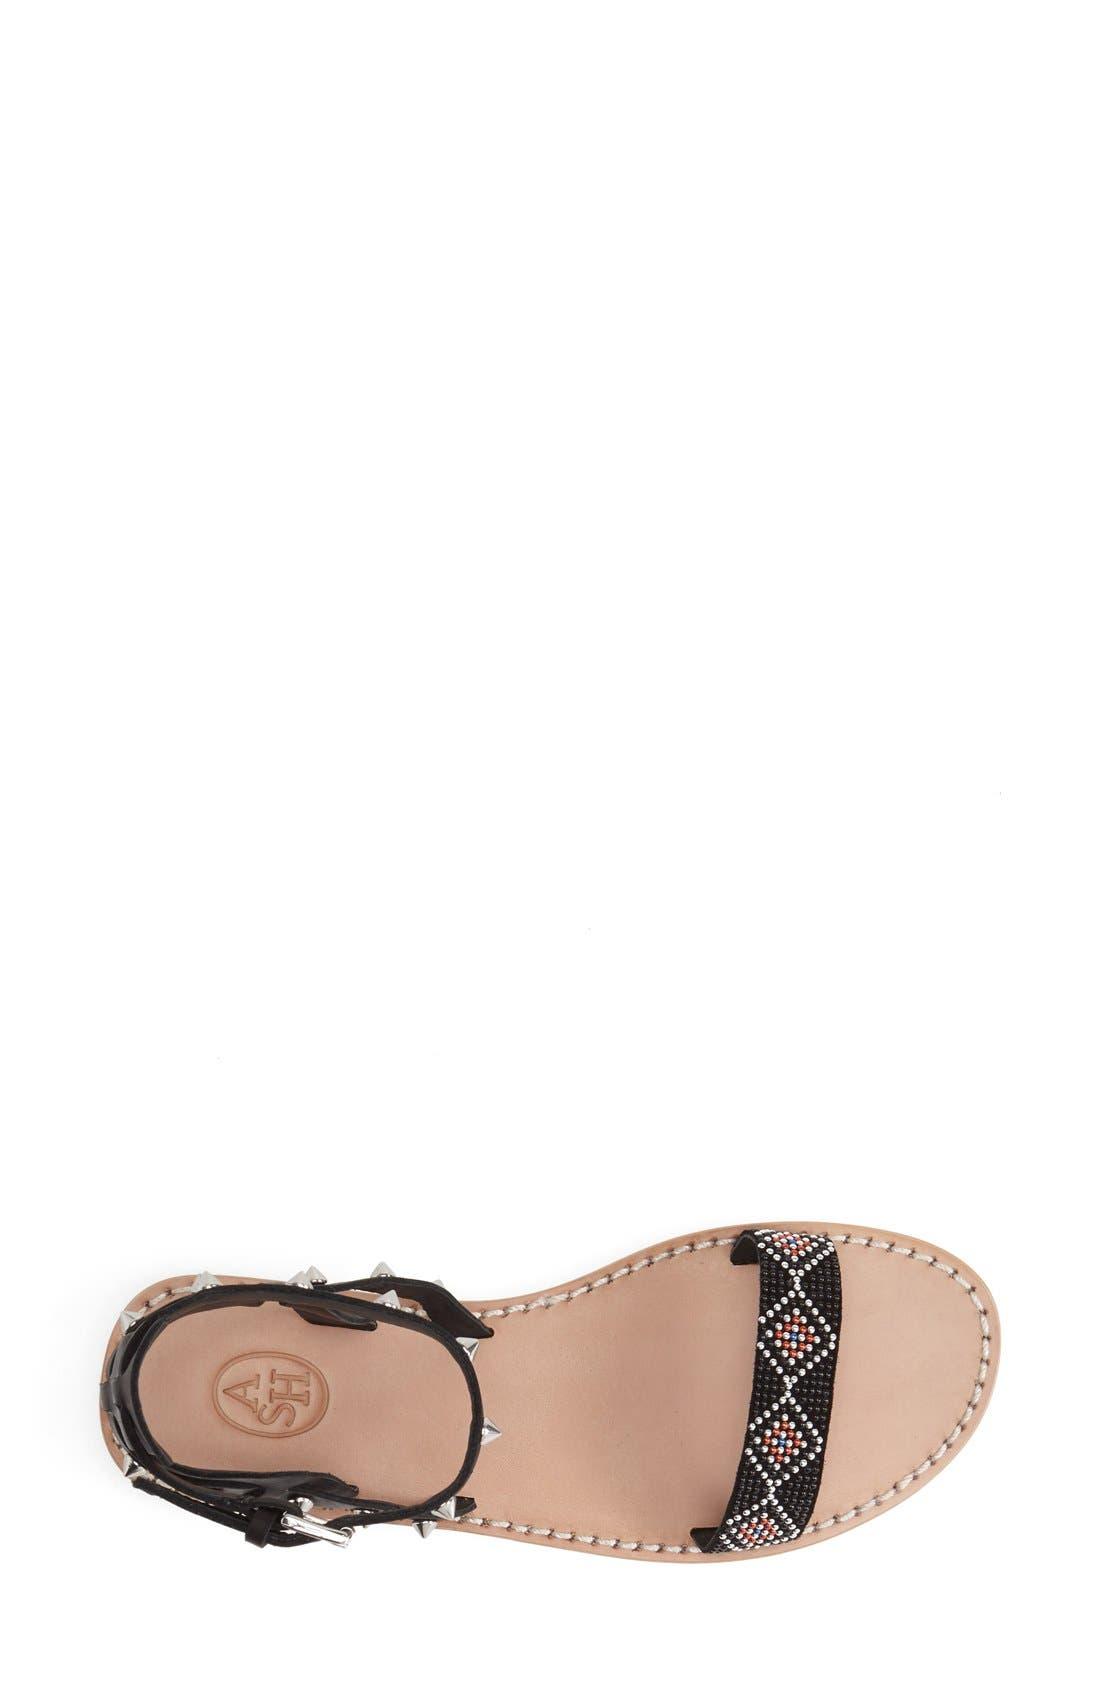 'Pearl' Studded Leather Sandal,                             Alternate thumbnail 3, color,                             Black/ Black